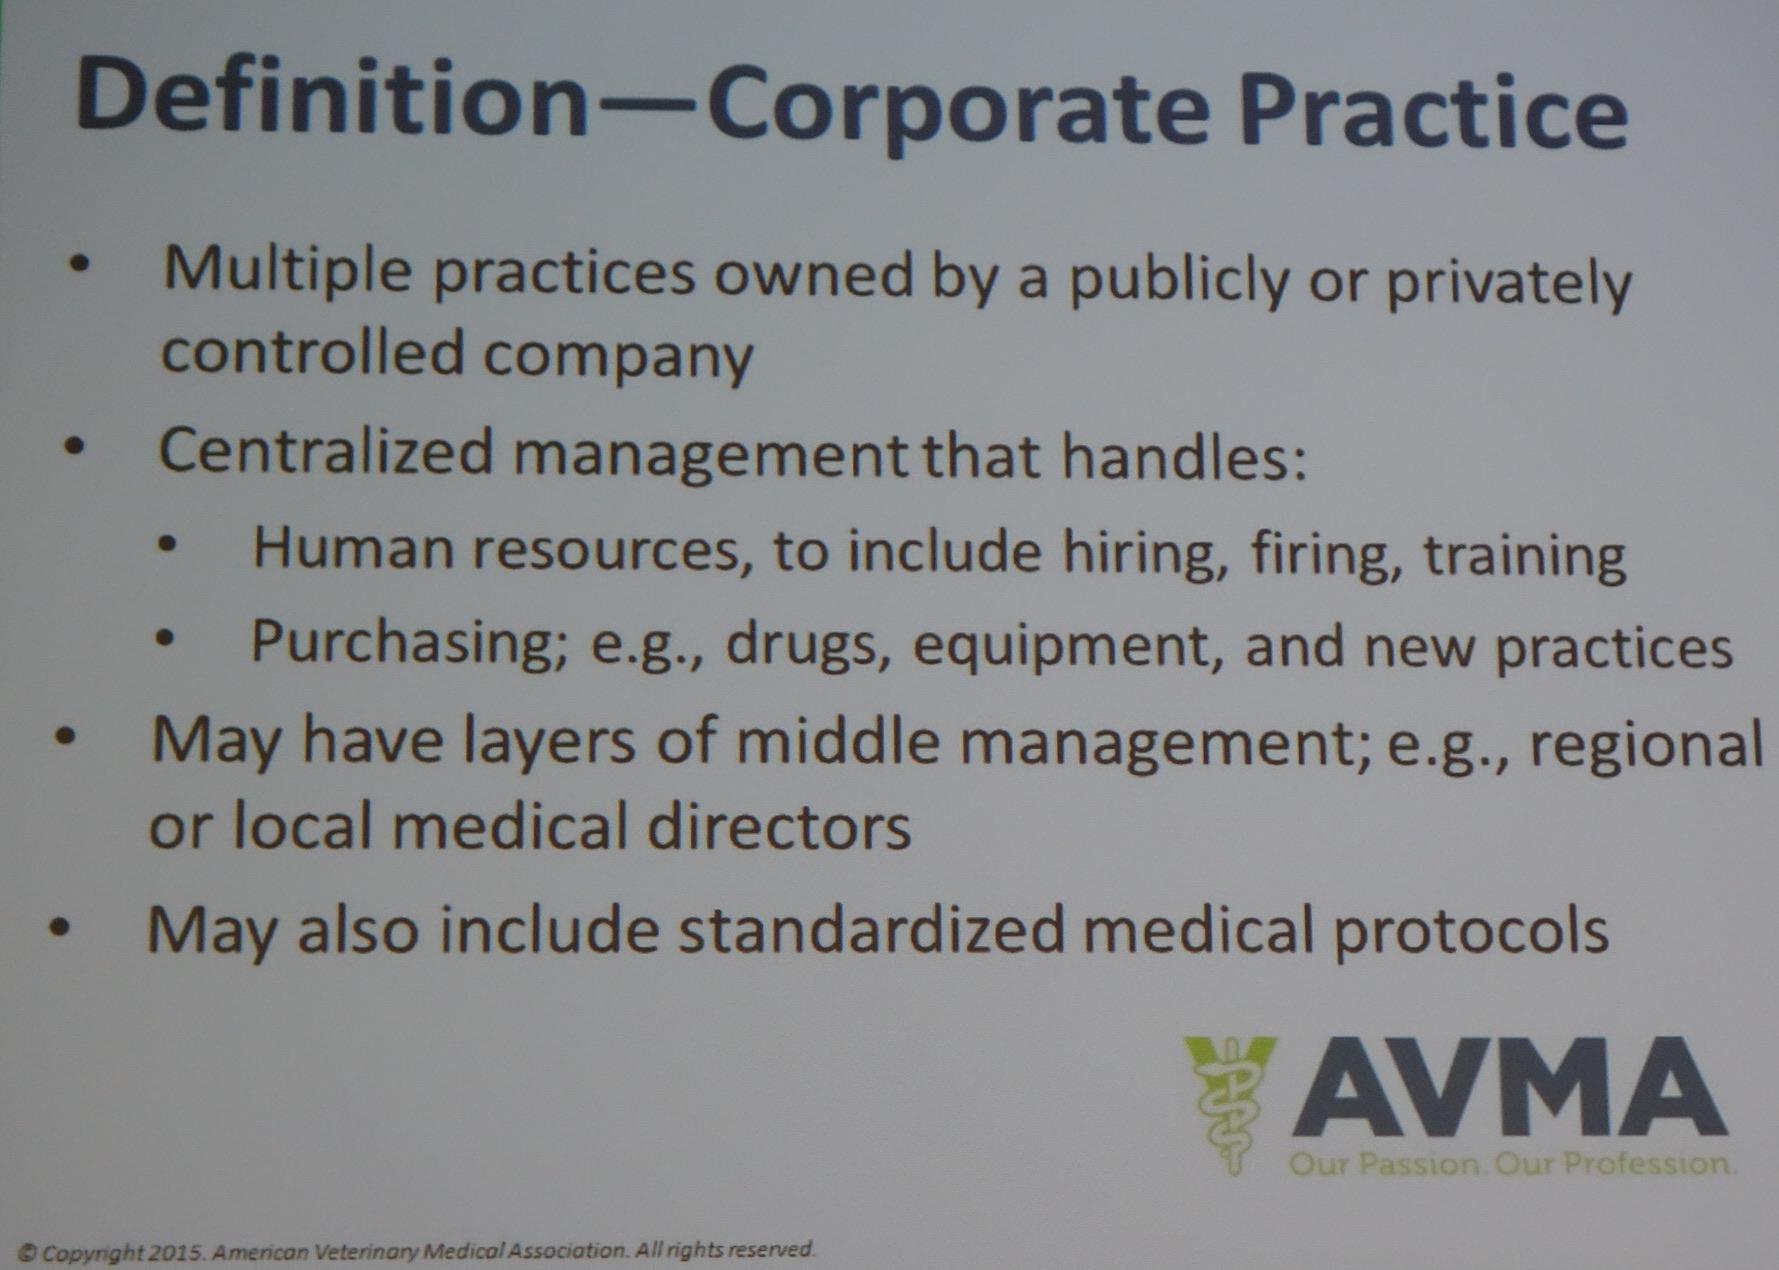 avma_corporates_definition